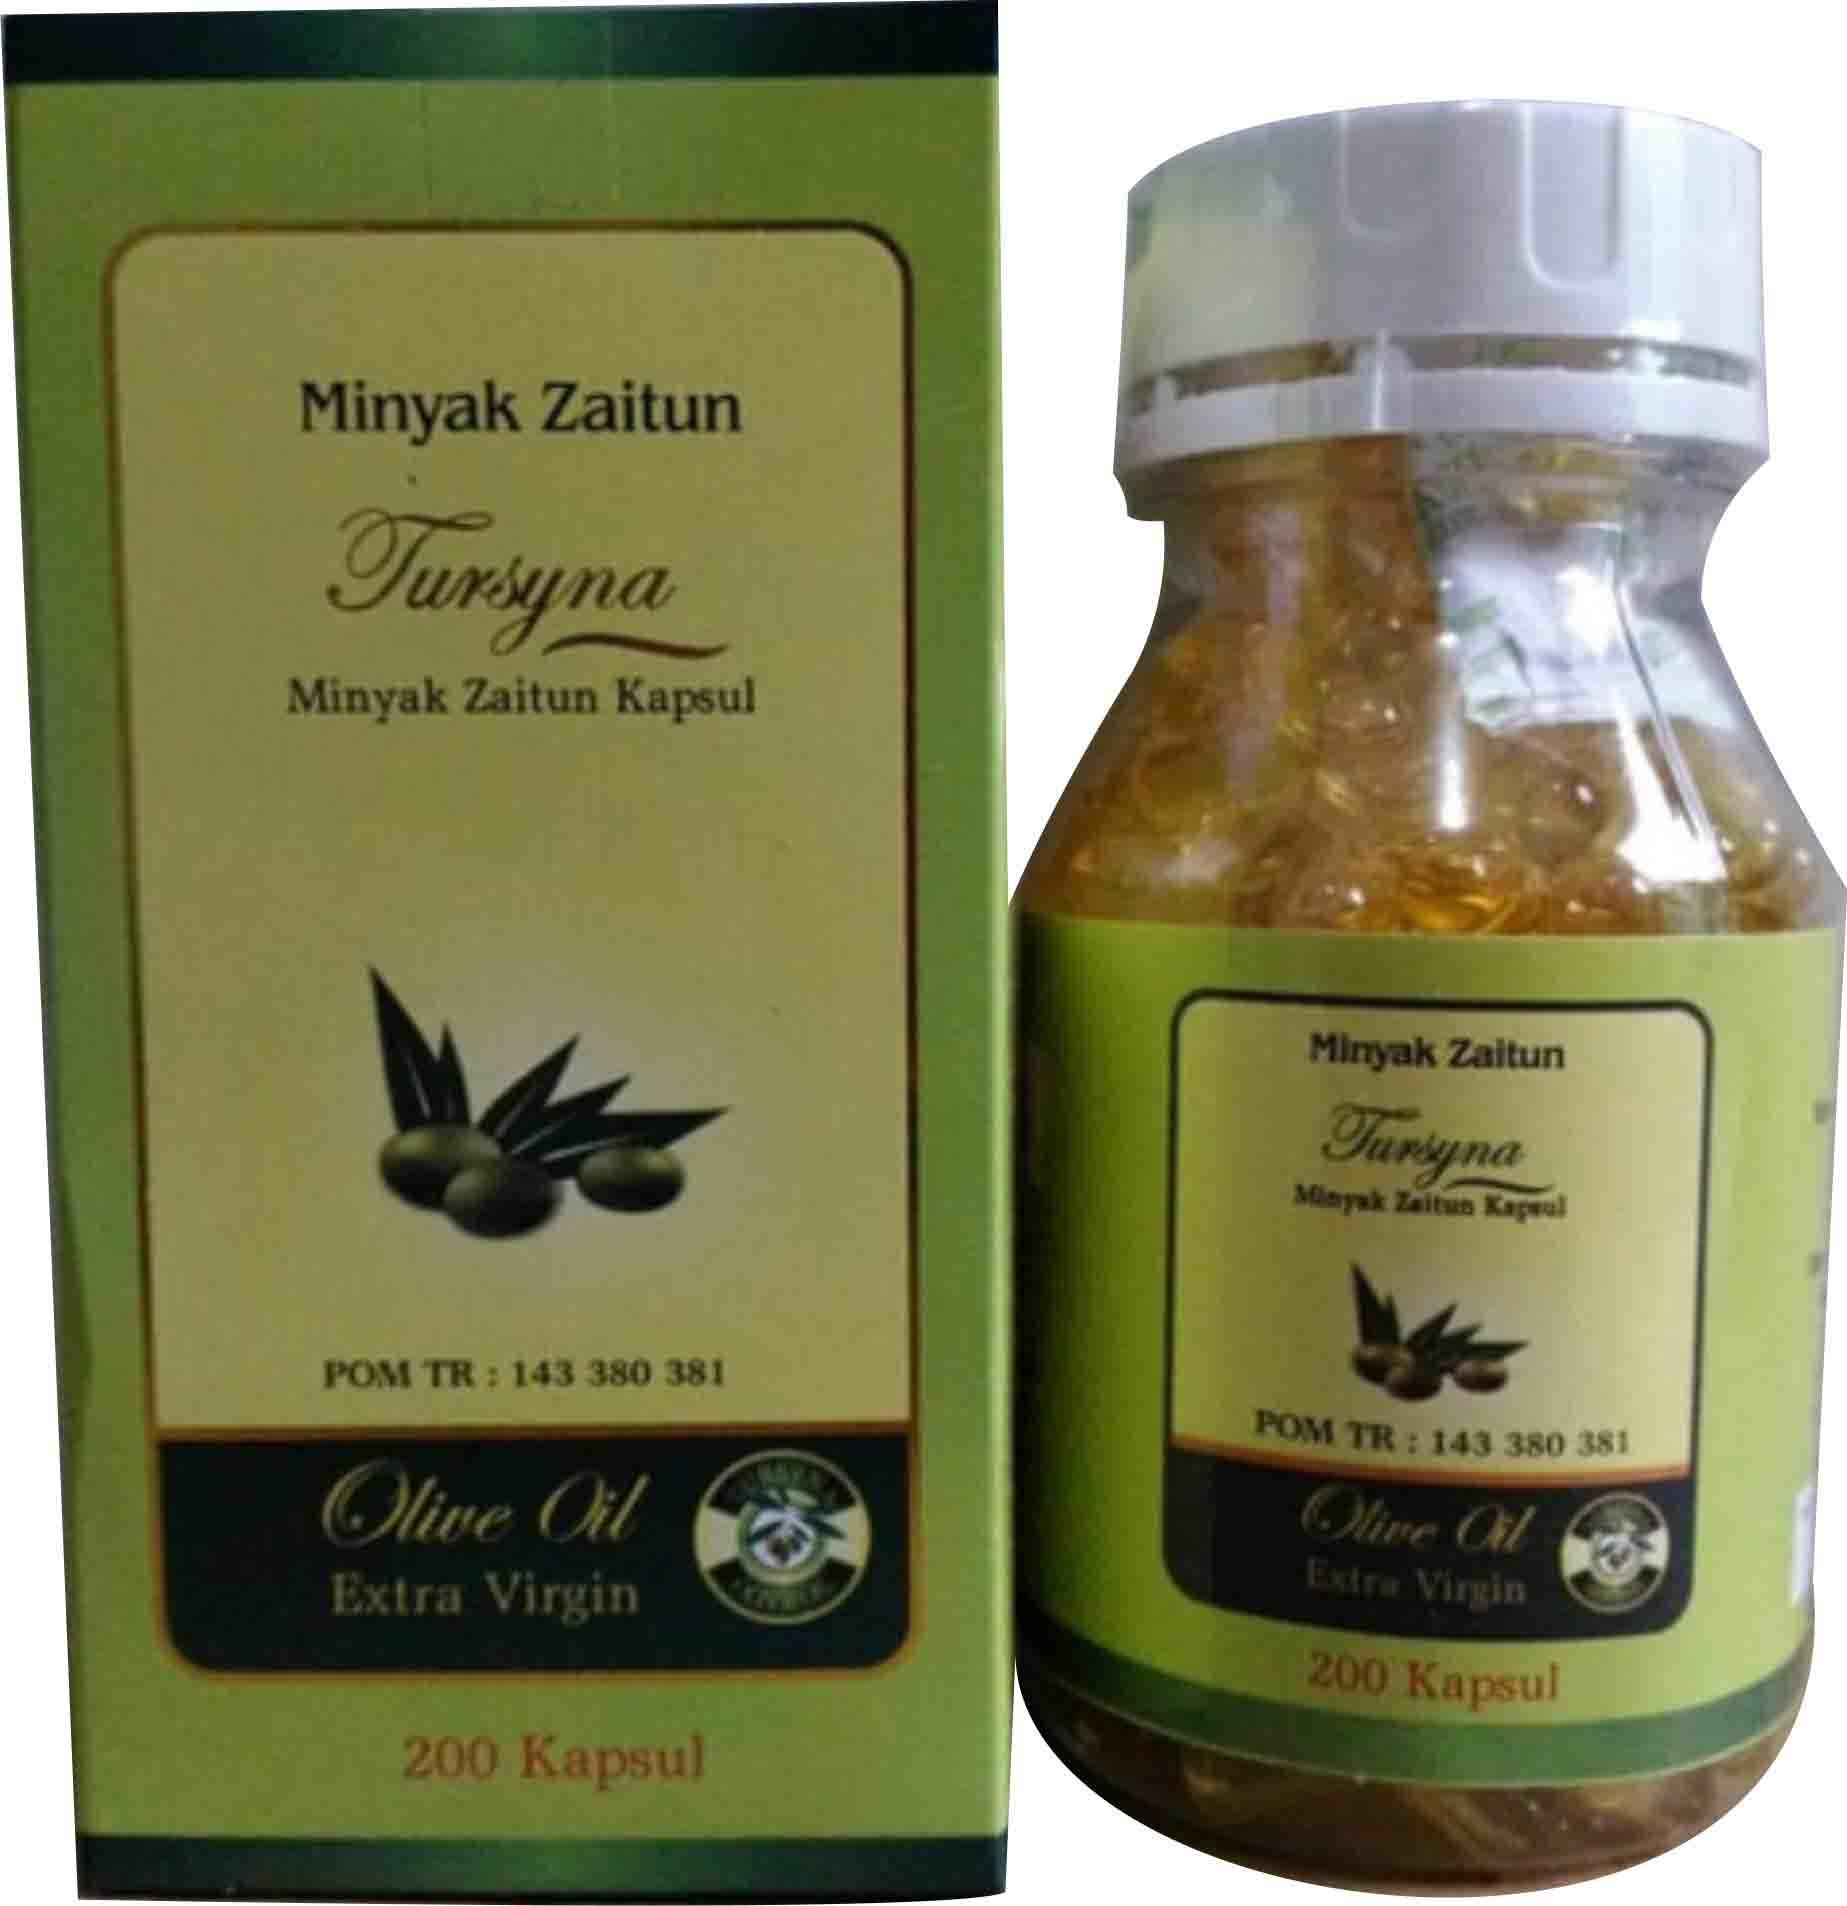 Kapsul Zaitun Al arobi  Zaitun Tursyna 200 kp/Kapsul Minyak Zaitun Al Arobi extra virgin oil olive